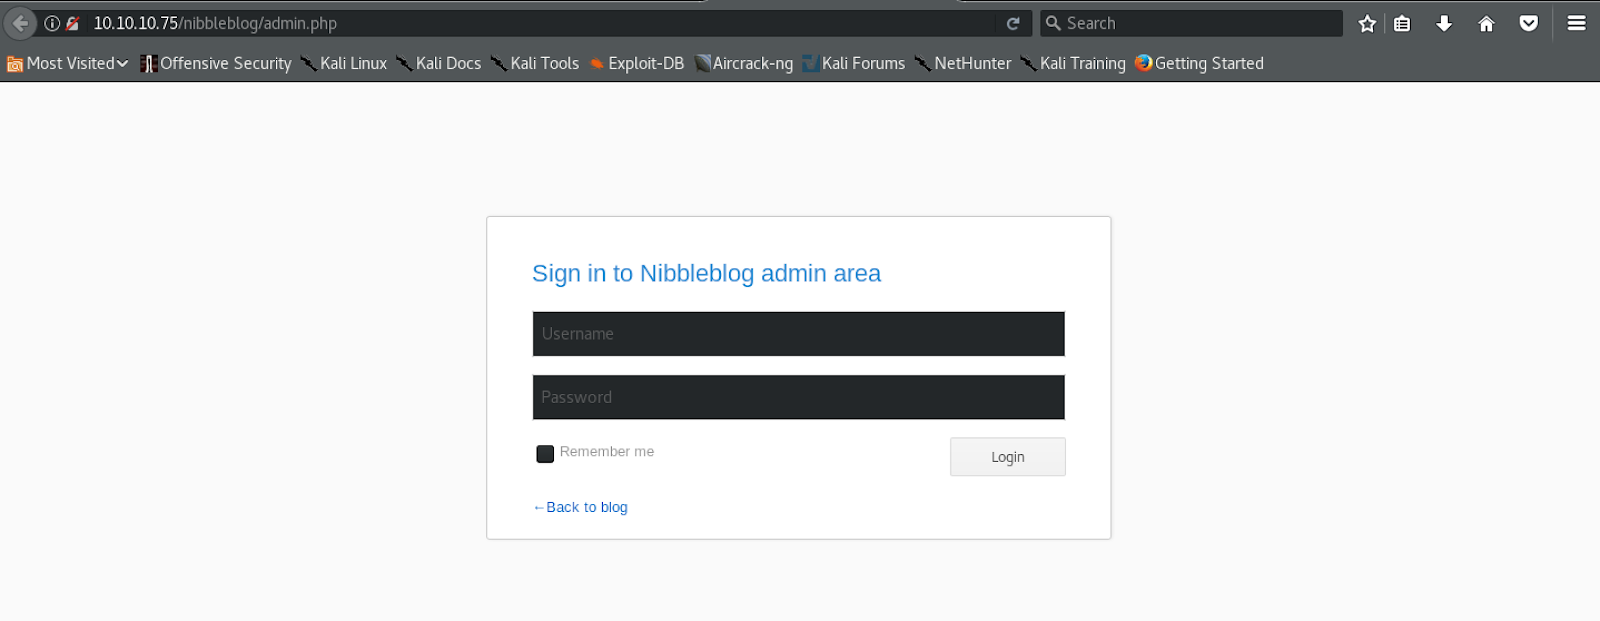 Hack The Box: Nibbles | kphongag's blog